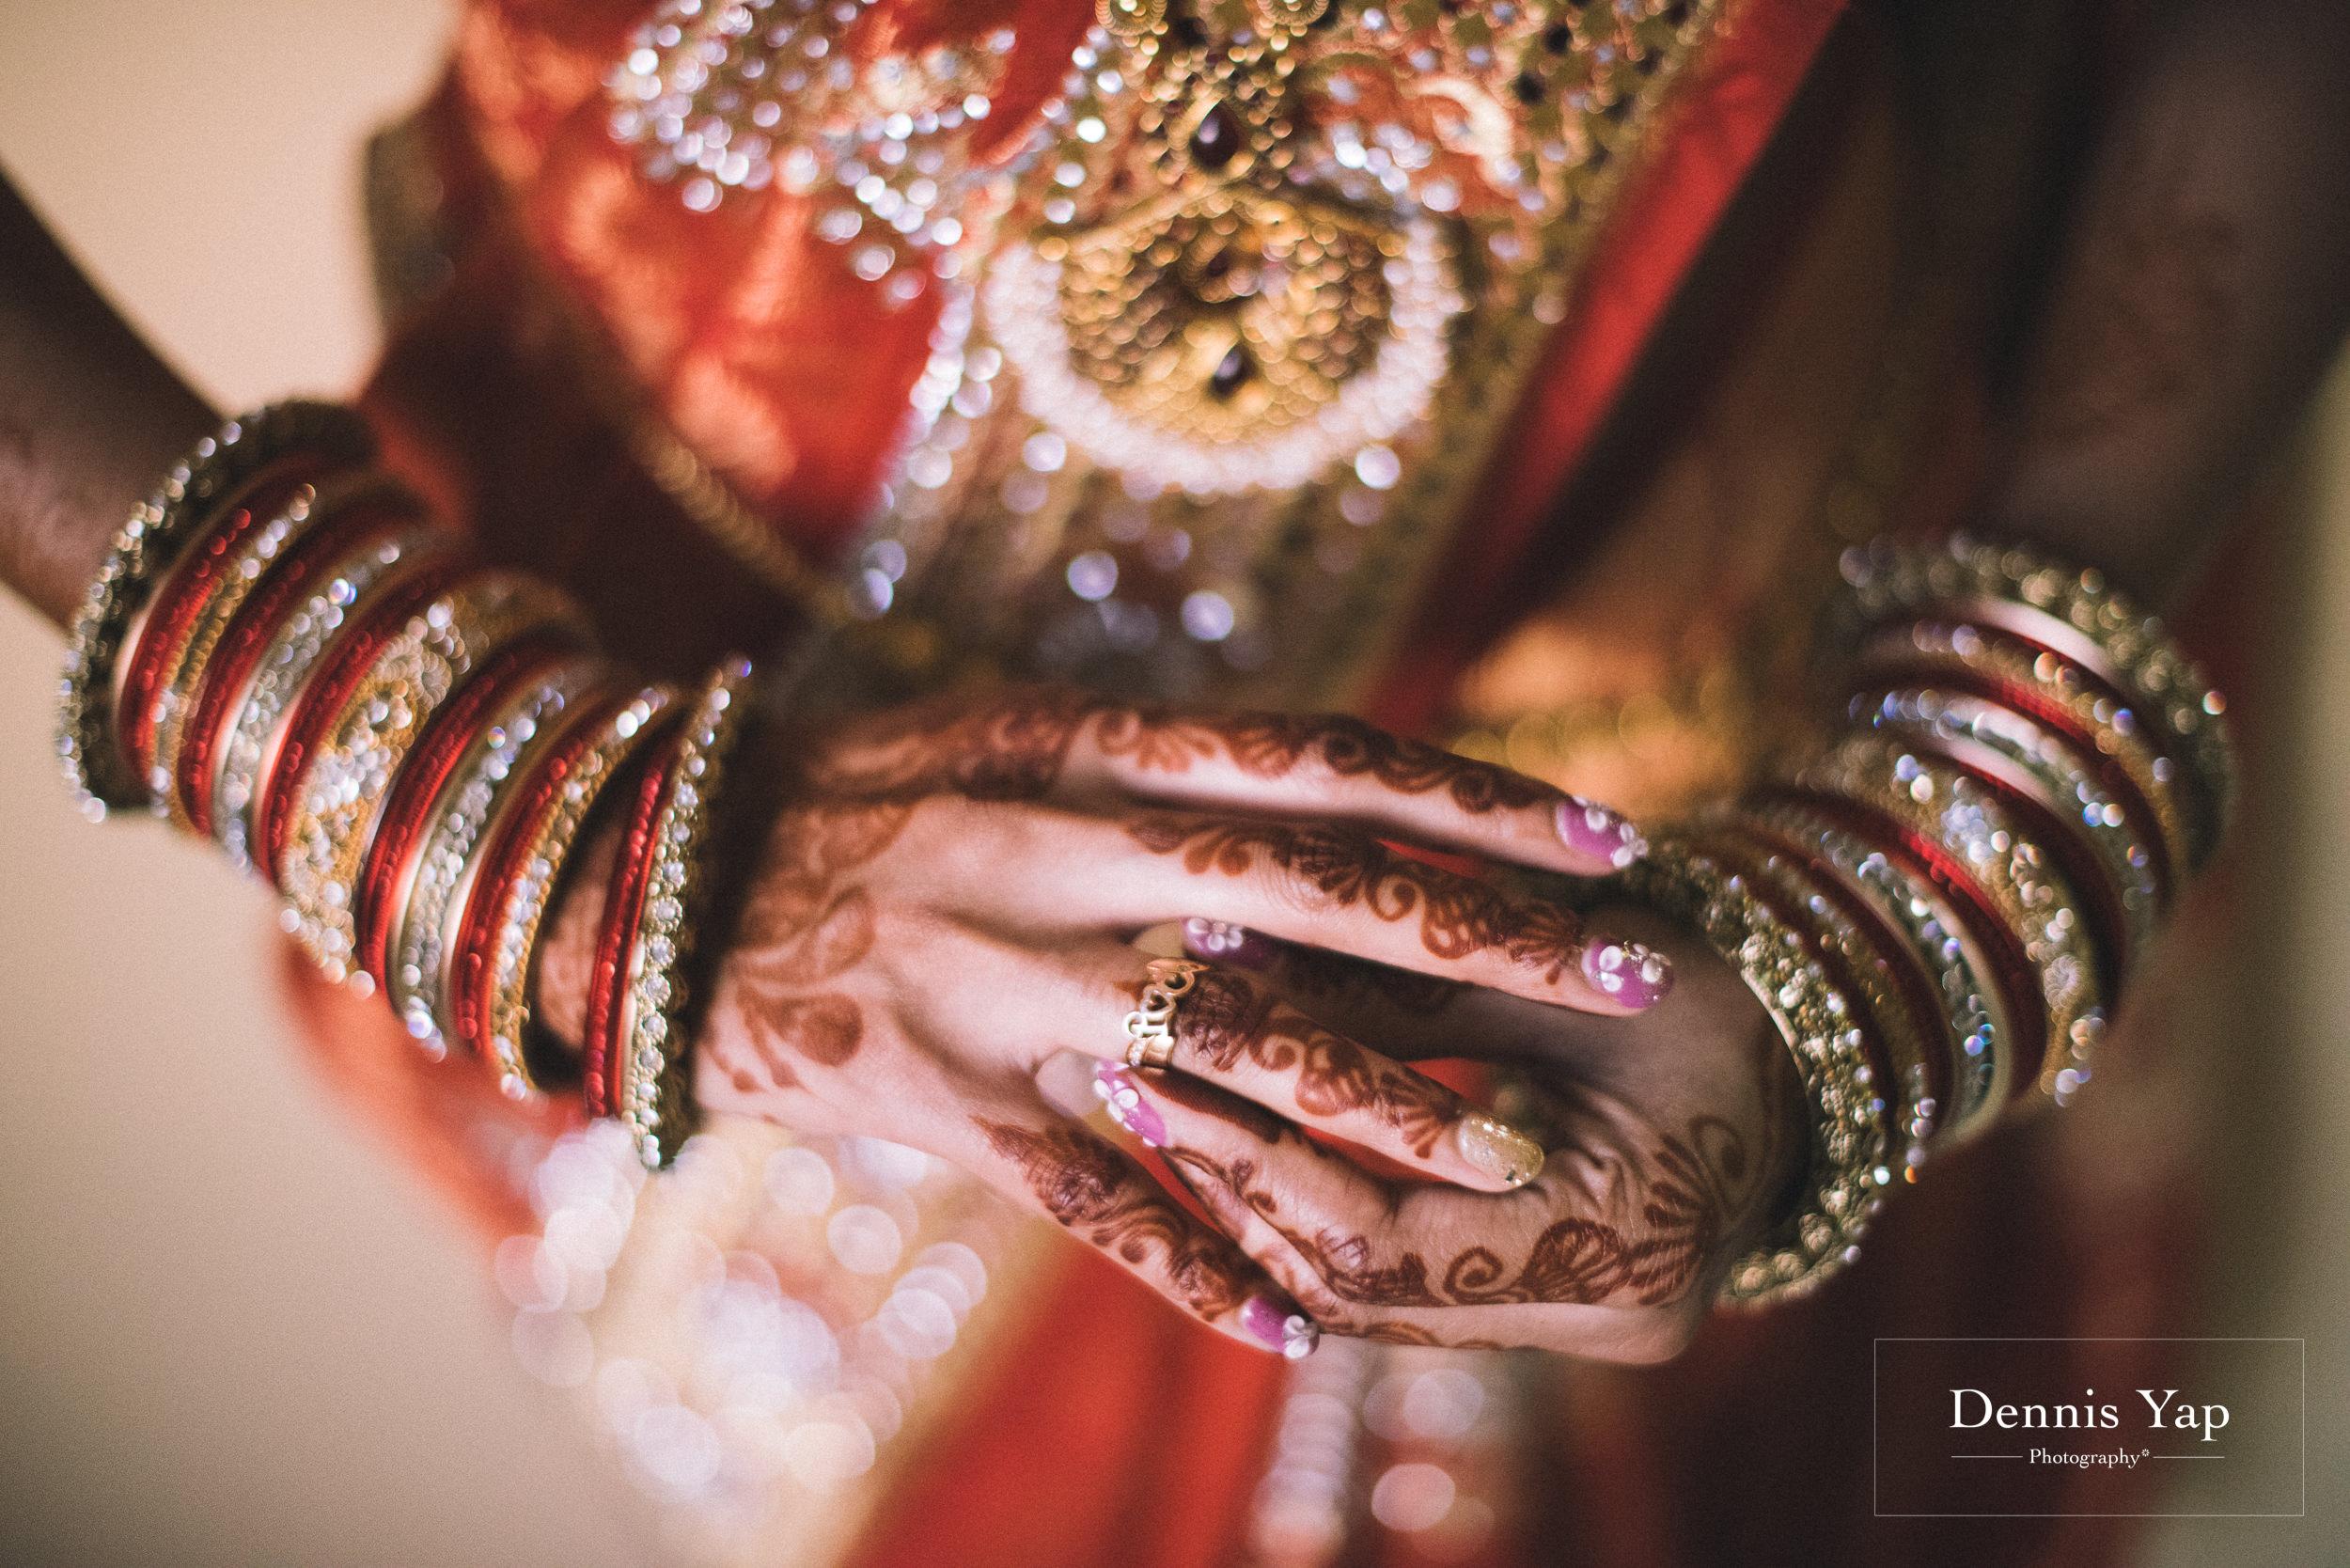 puvaneswaran cangitaa indian wedding ceremony ideal convention dennis yap photography malaysia-1.jpg